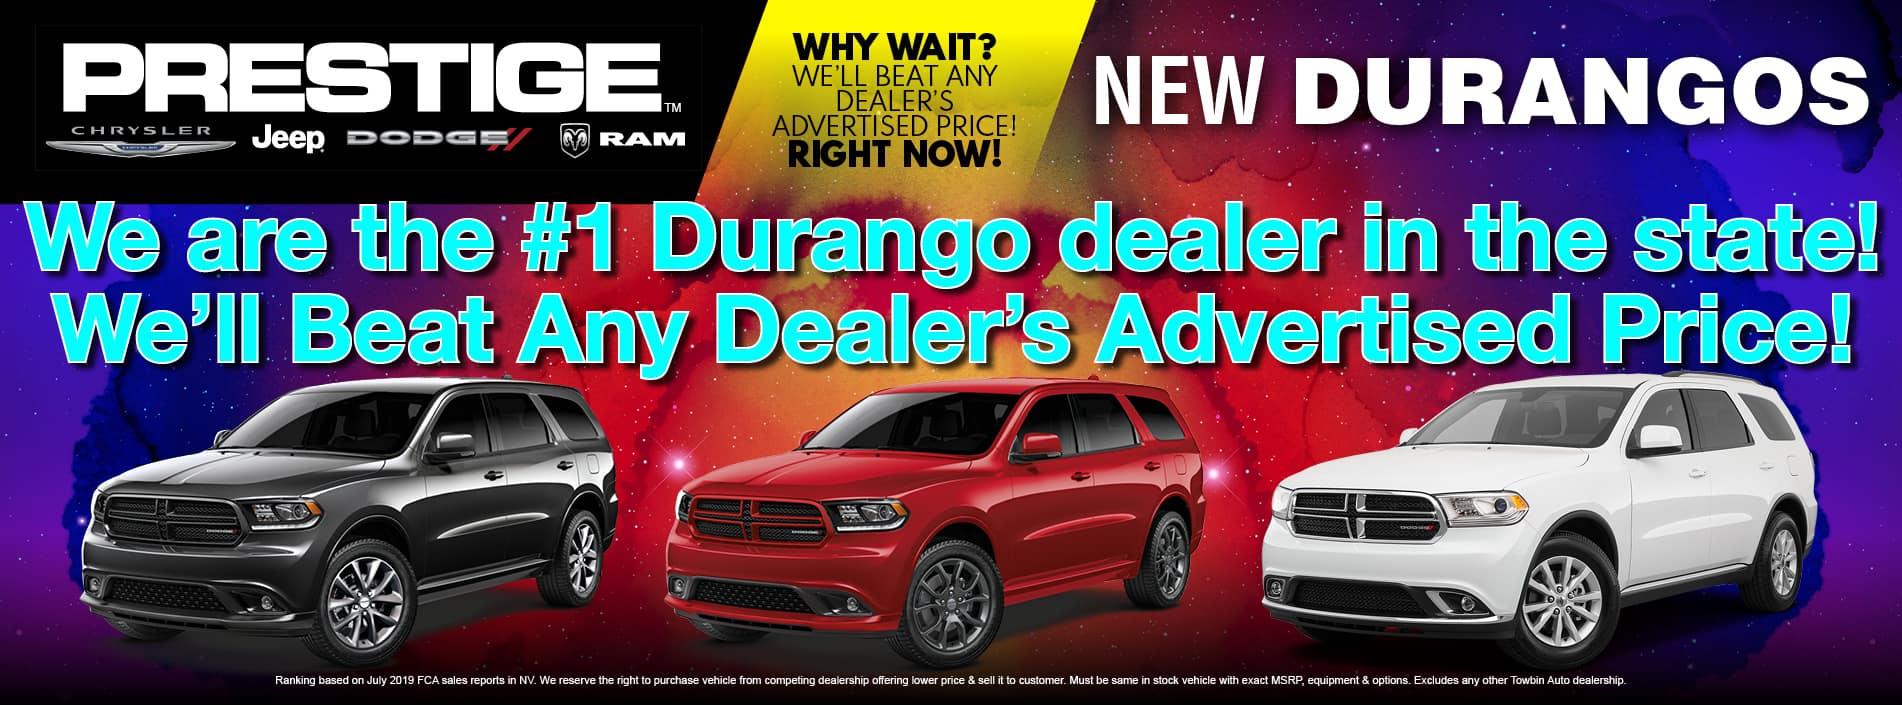 Prestige Chrysler Jeep Dodge LLC | CDJR Dealer in Las Vegas, NV